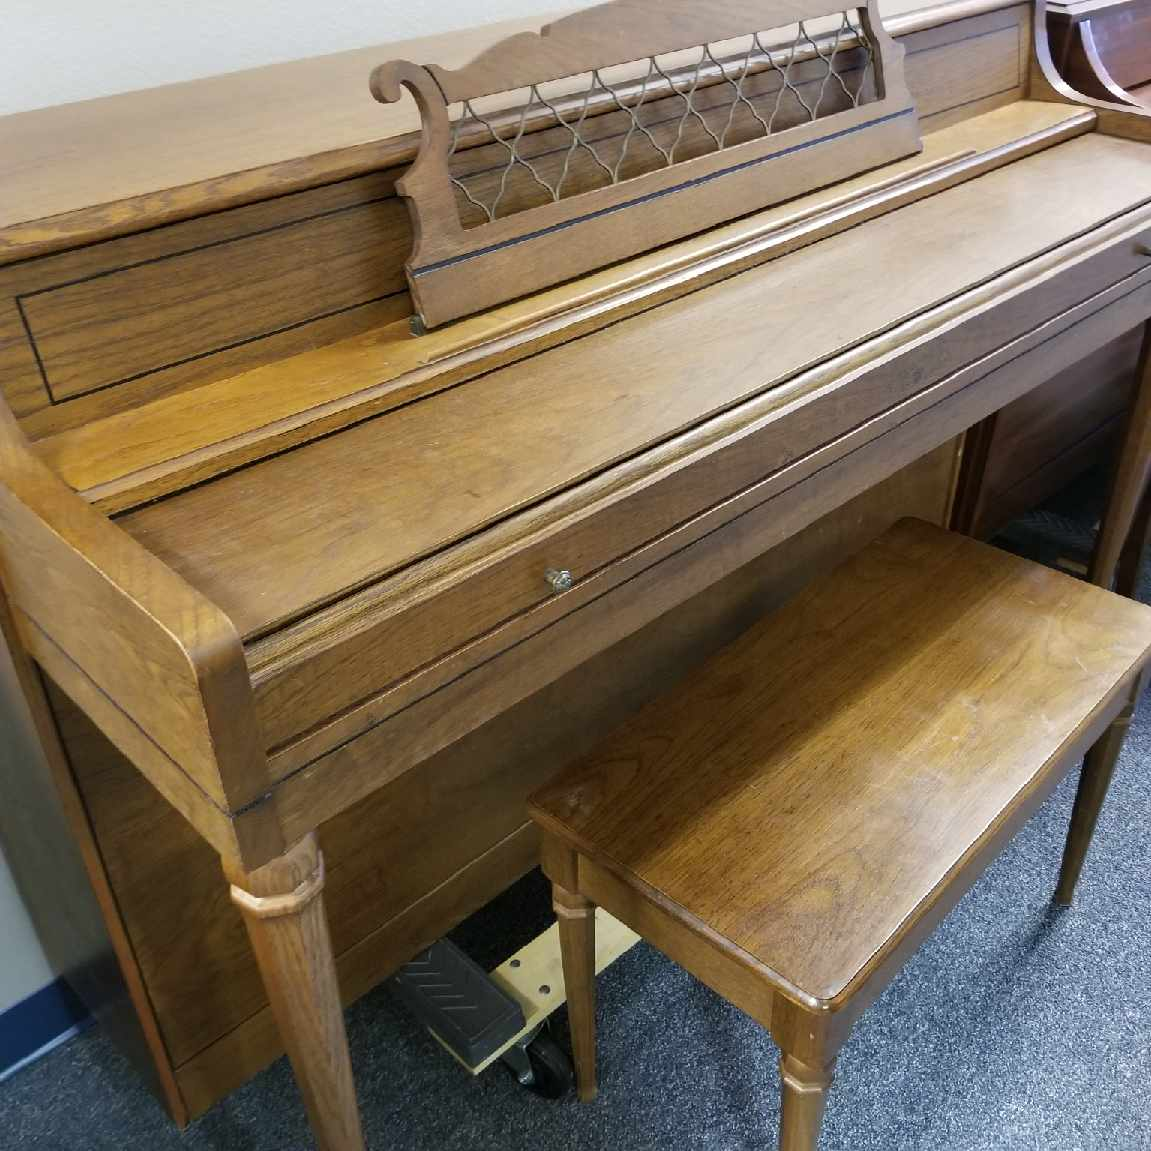 Rudolph Wurlitzer Pecan Spinet The Piano Guys